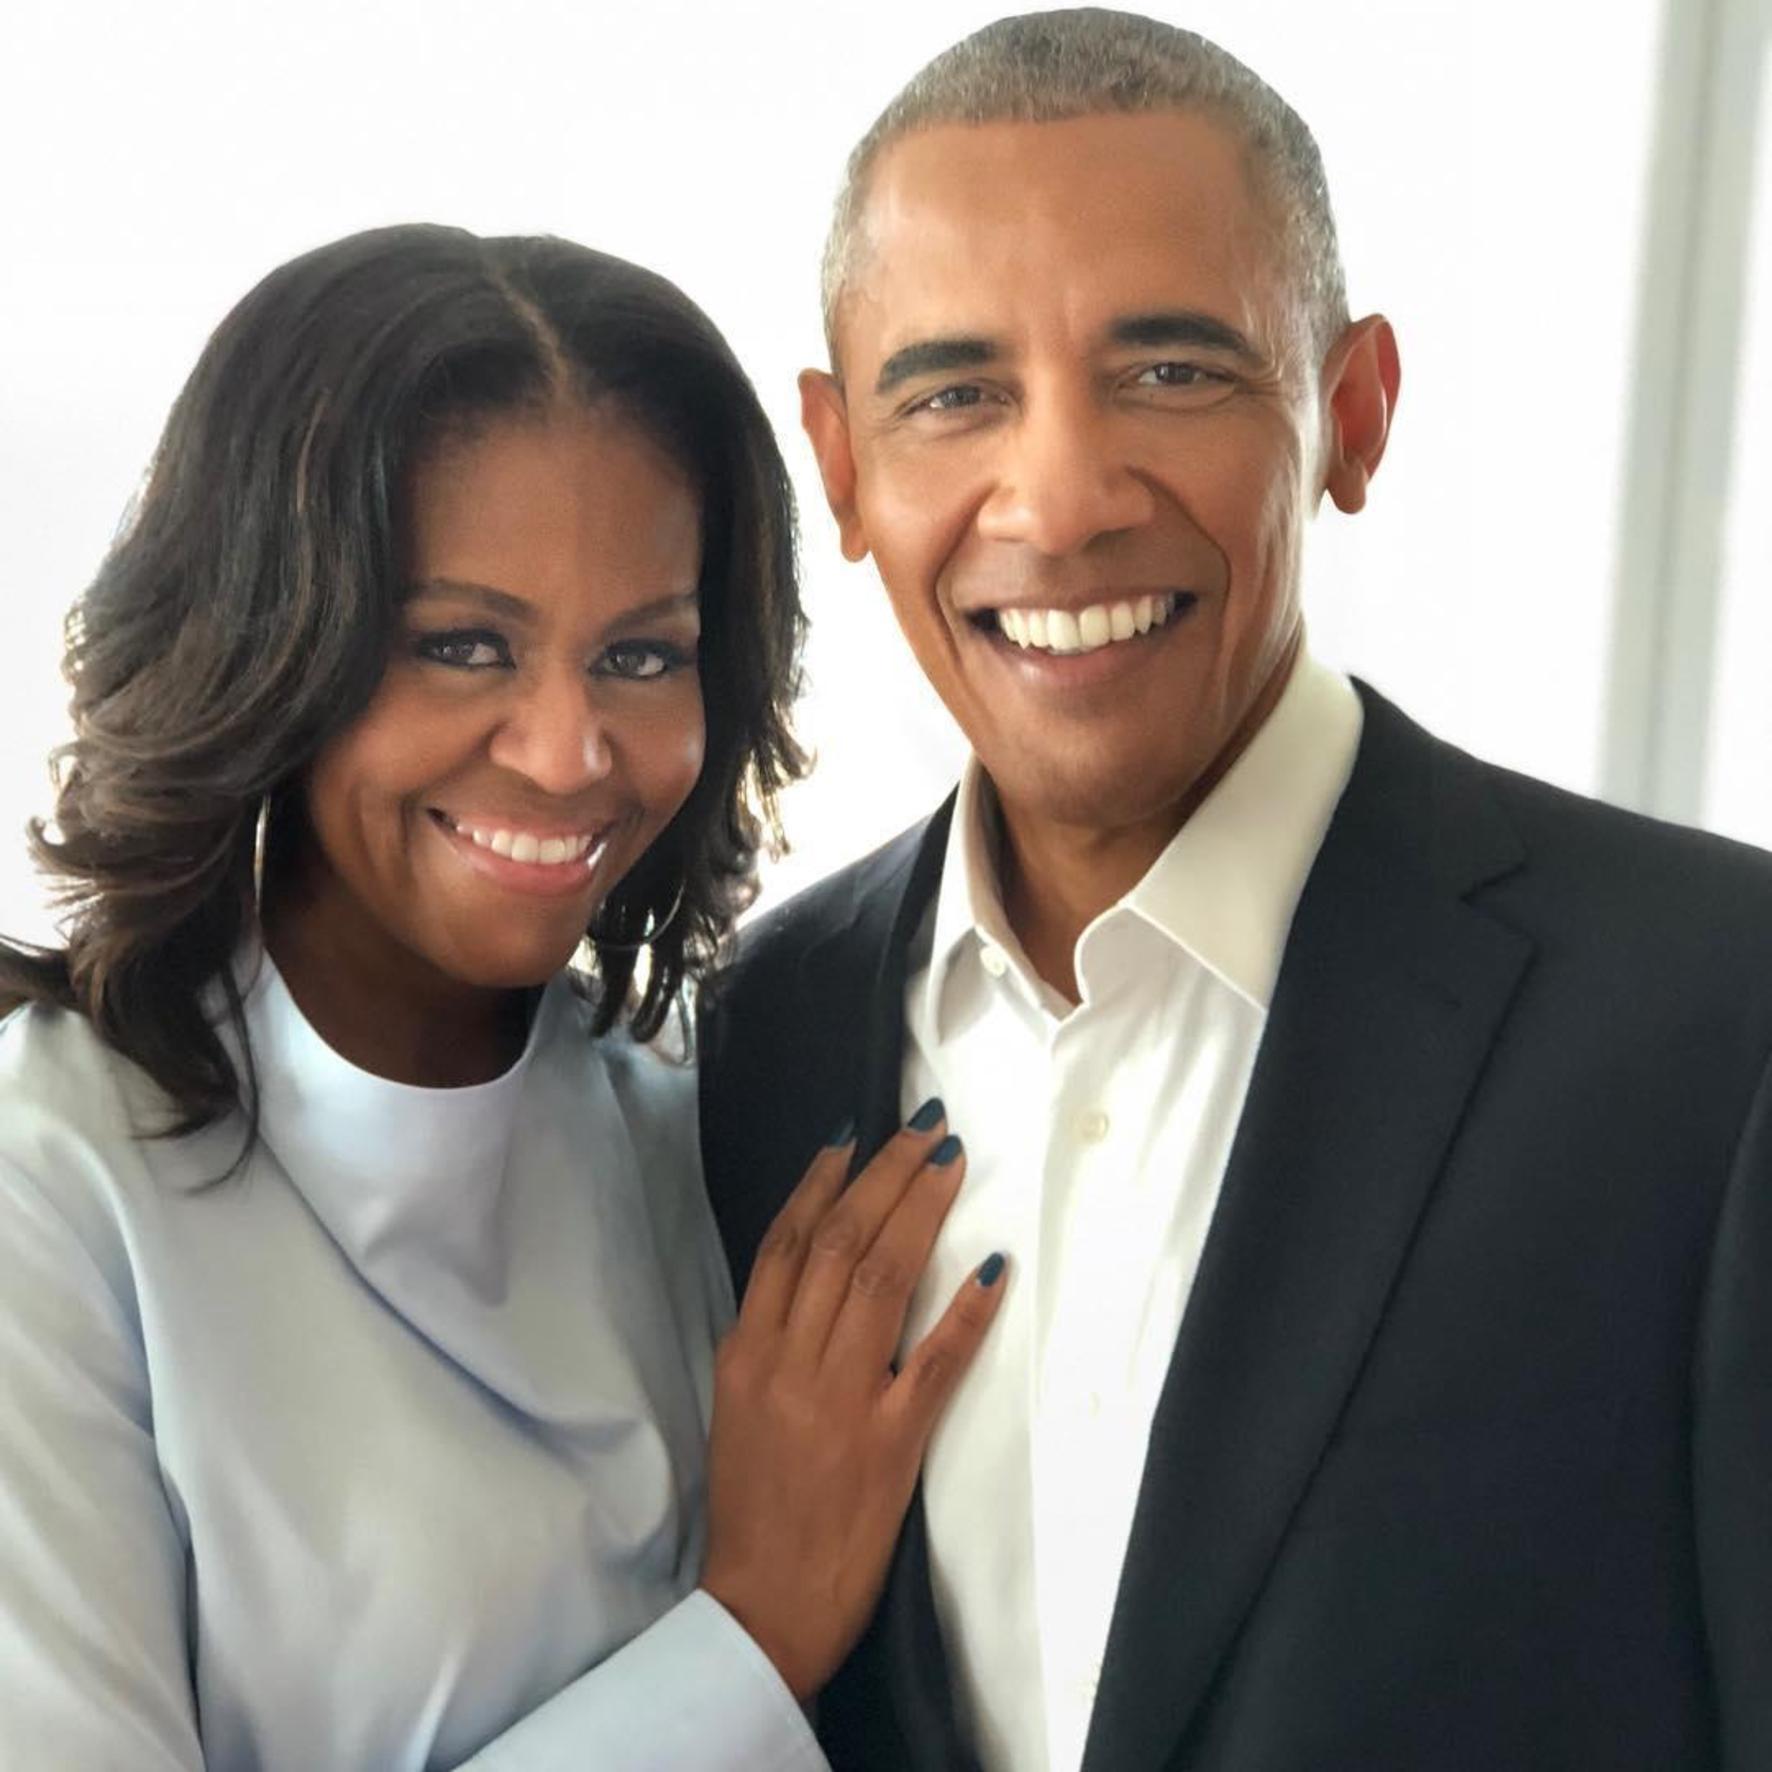 Michelle Obama (michelleobama / 31.10.2017):